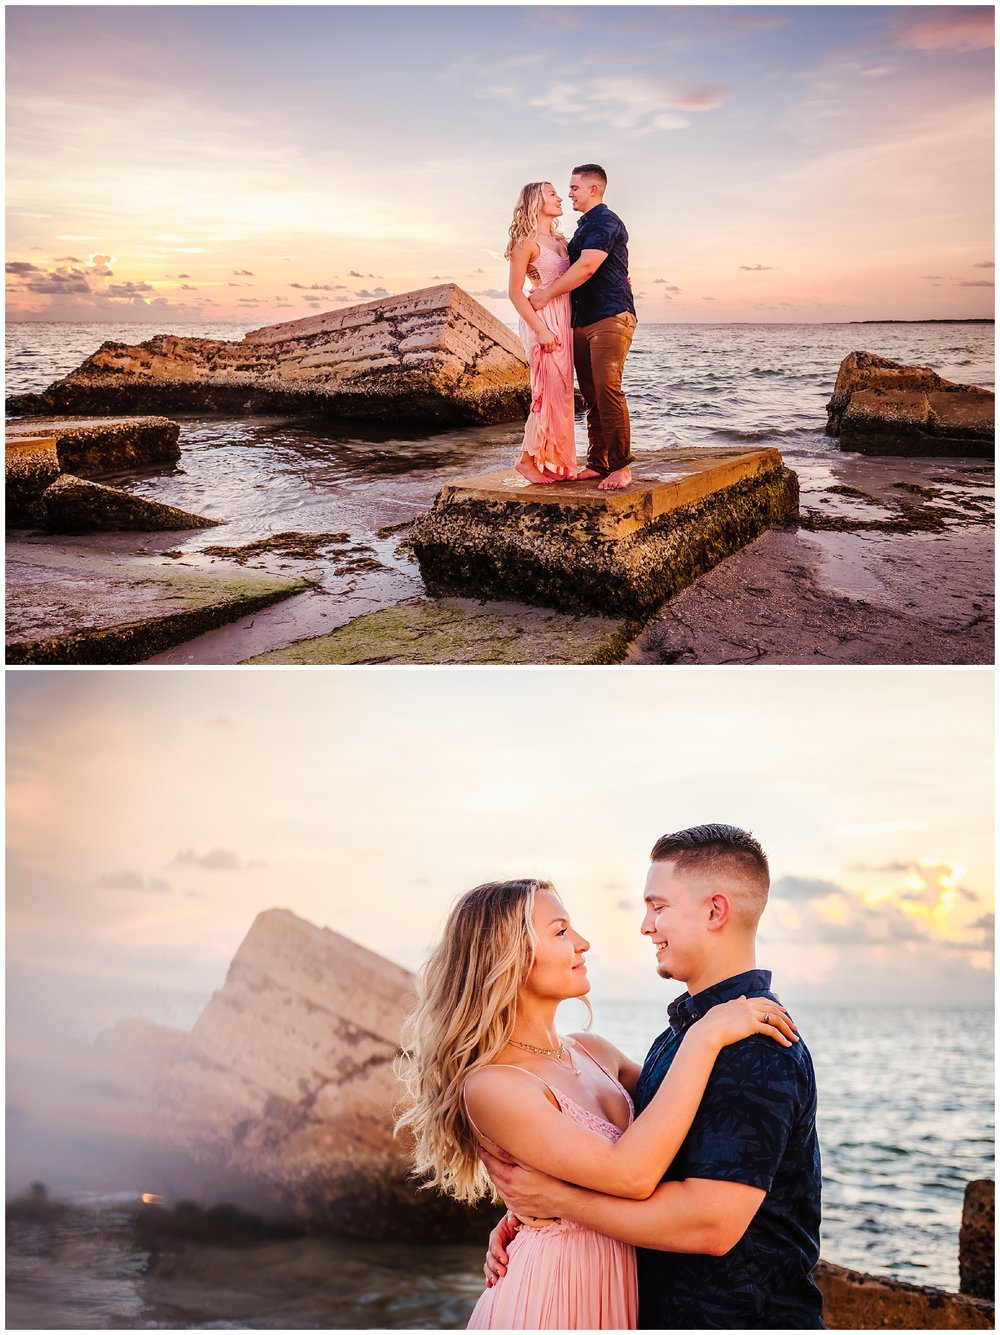 fort-desoto-engagement-photos-florida-beach-sunset_0248.jpg